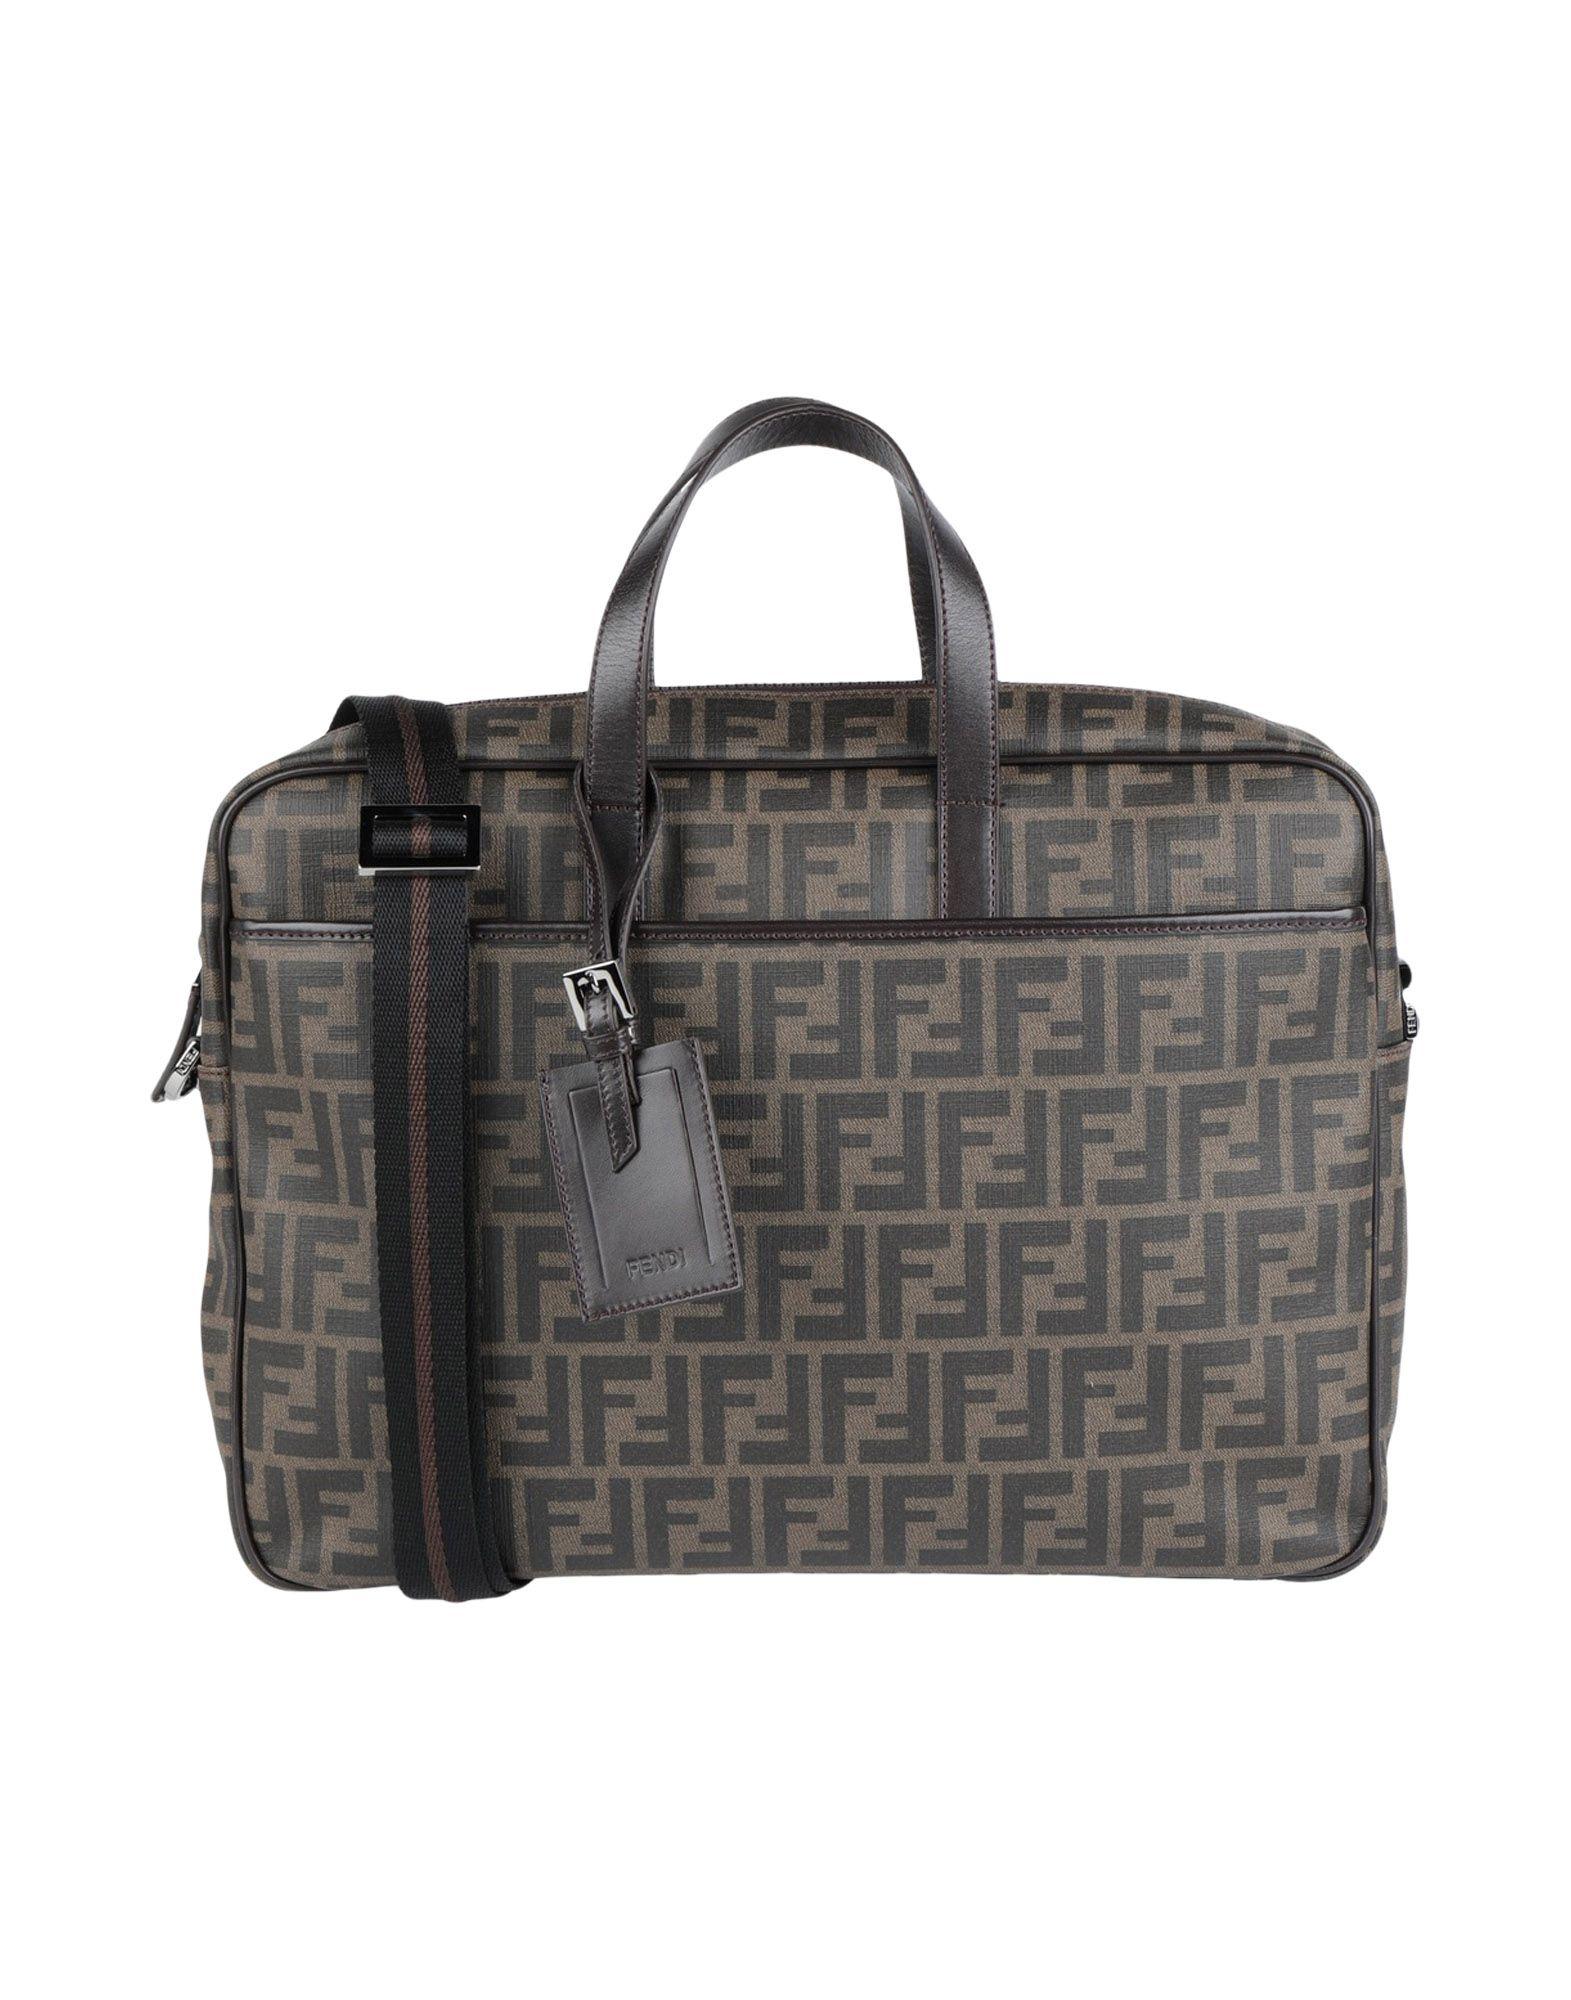 ... official fendi work bag men fendi work bags online on yoox united  states 4992e db7a6 efec38f81c1b0